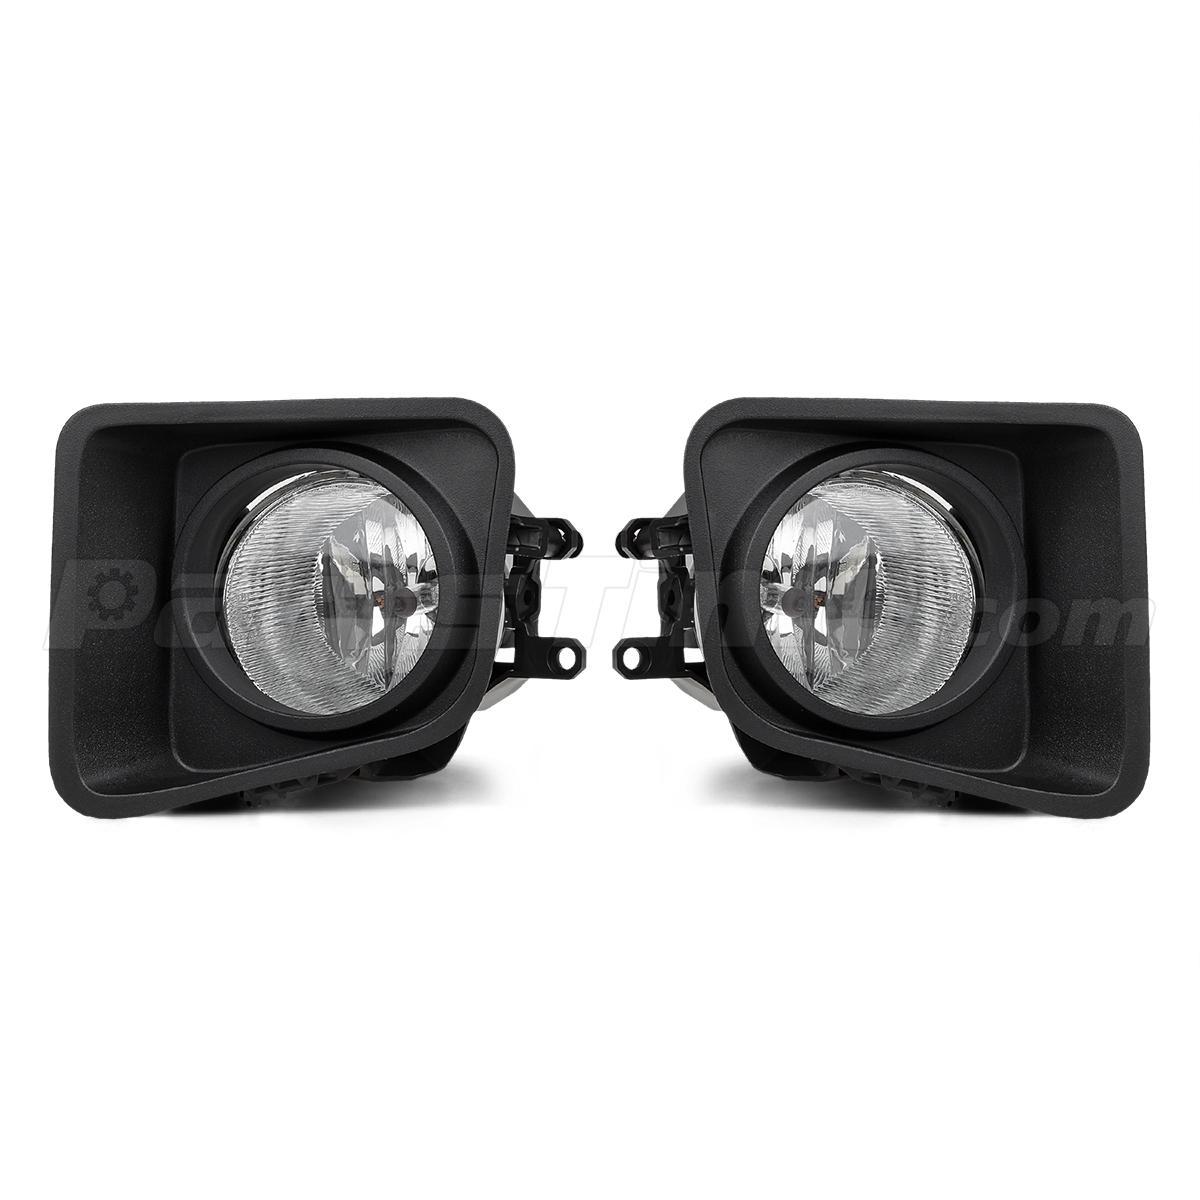 2014 2015 Silverado Right Tail Light Wiring Harness New Ebay